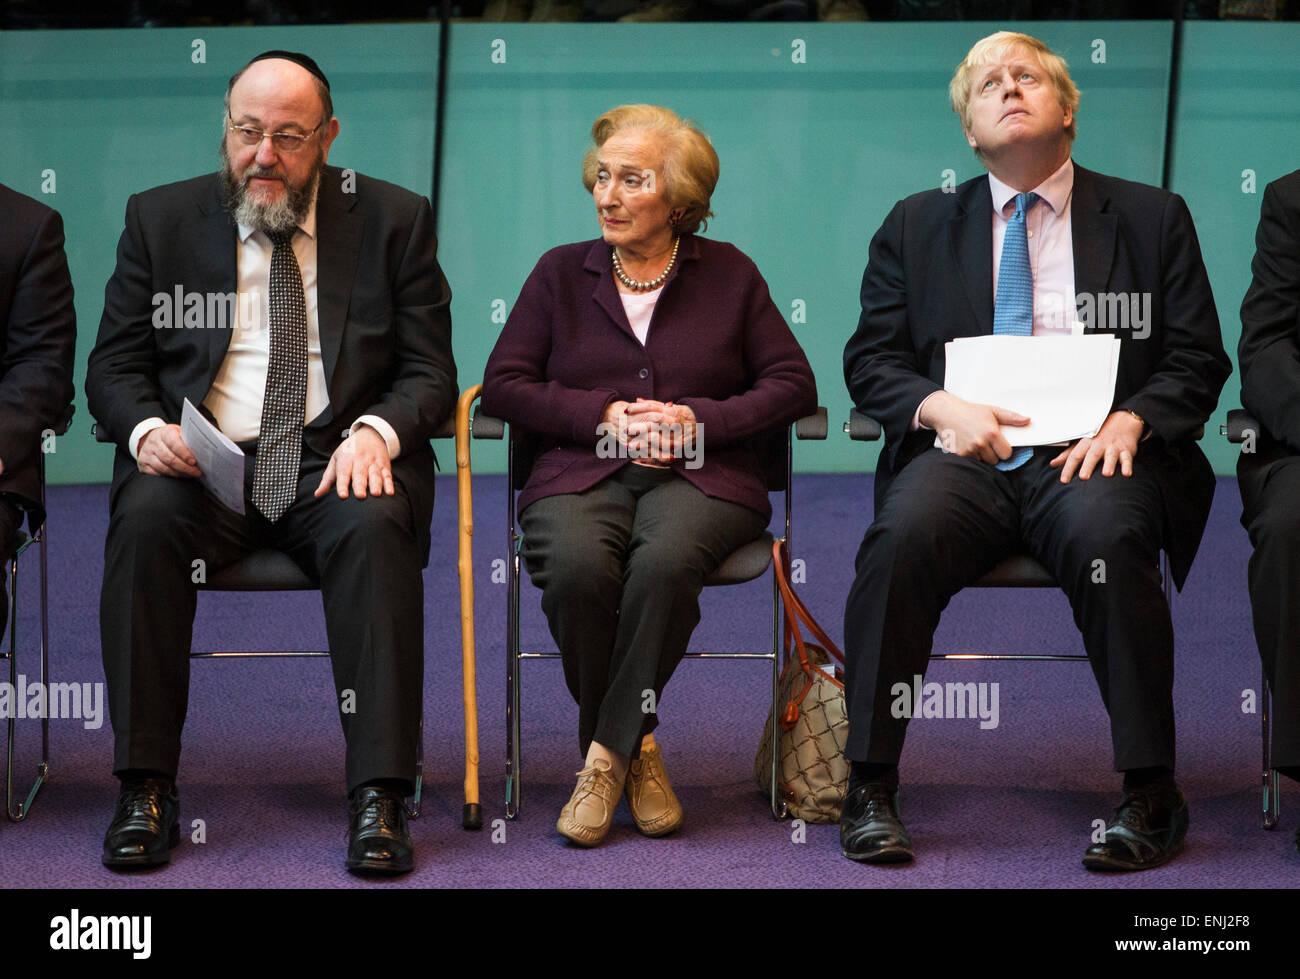 UNITED KINGDOM, London : (L-R) Chief Rabbi Ephraim Mirvis, Holocaust survivor Freda Wineman and The Mayor of London - Stock Image